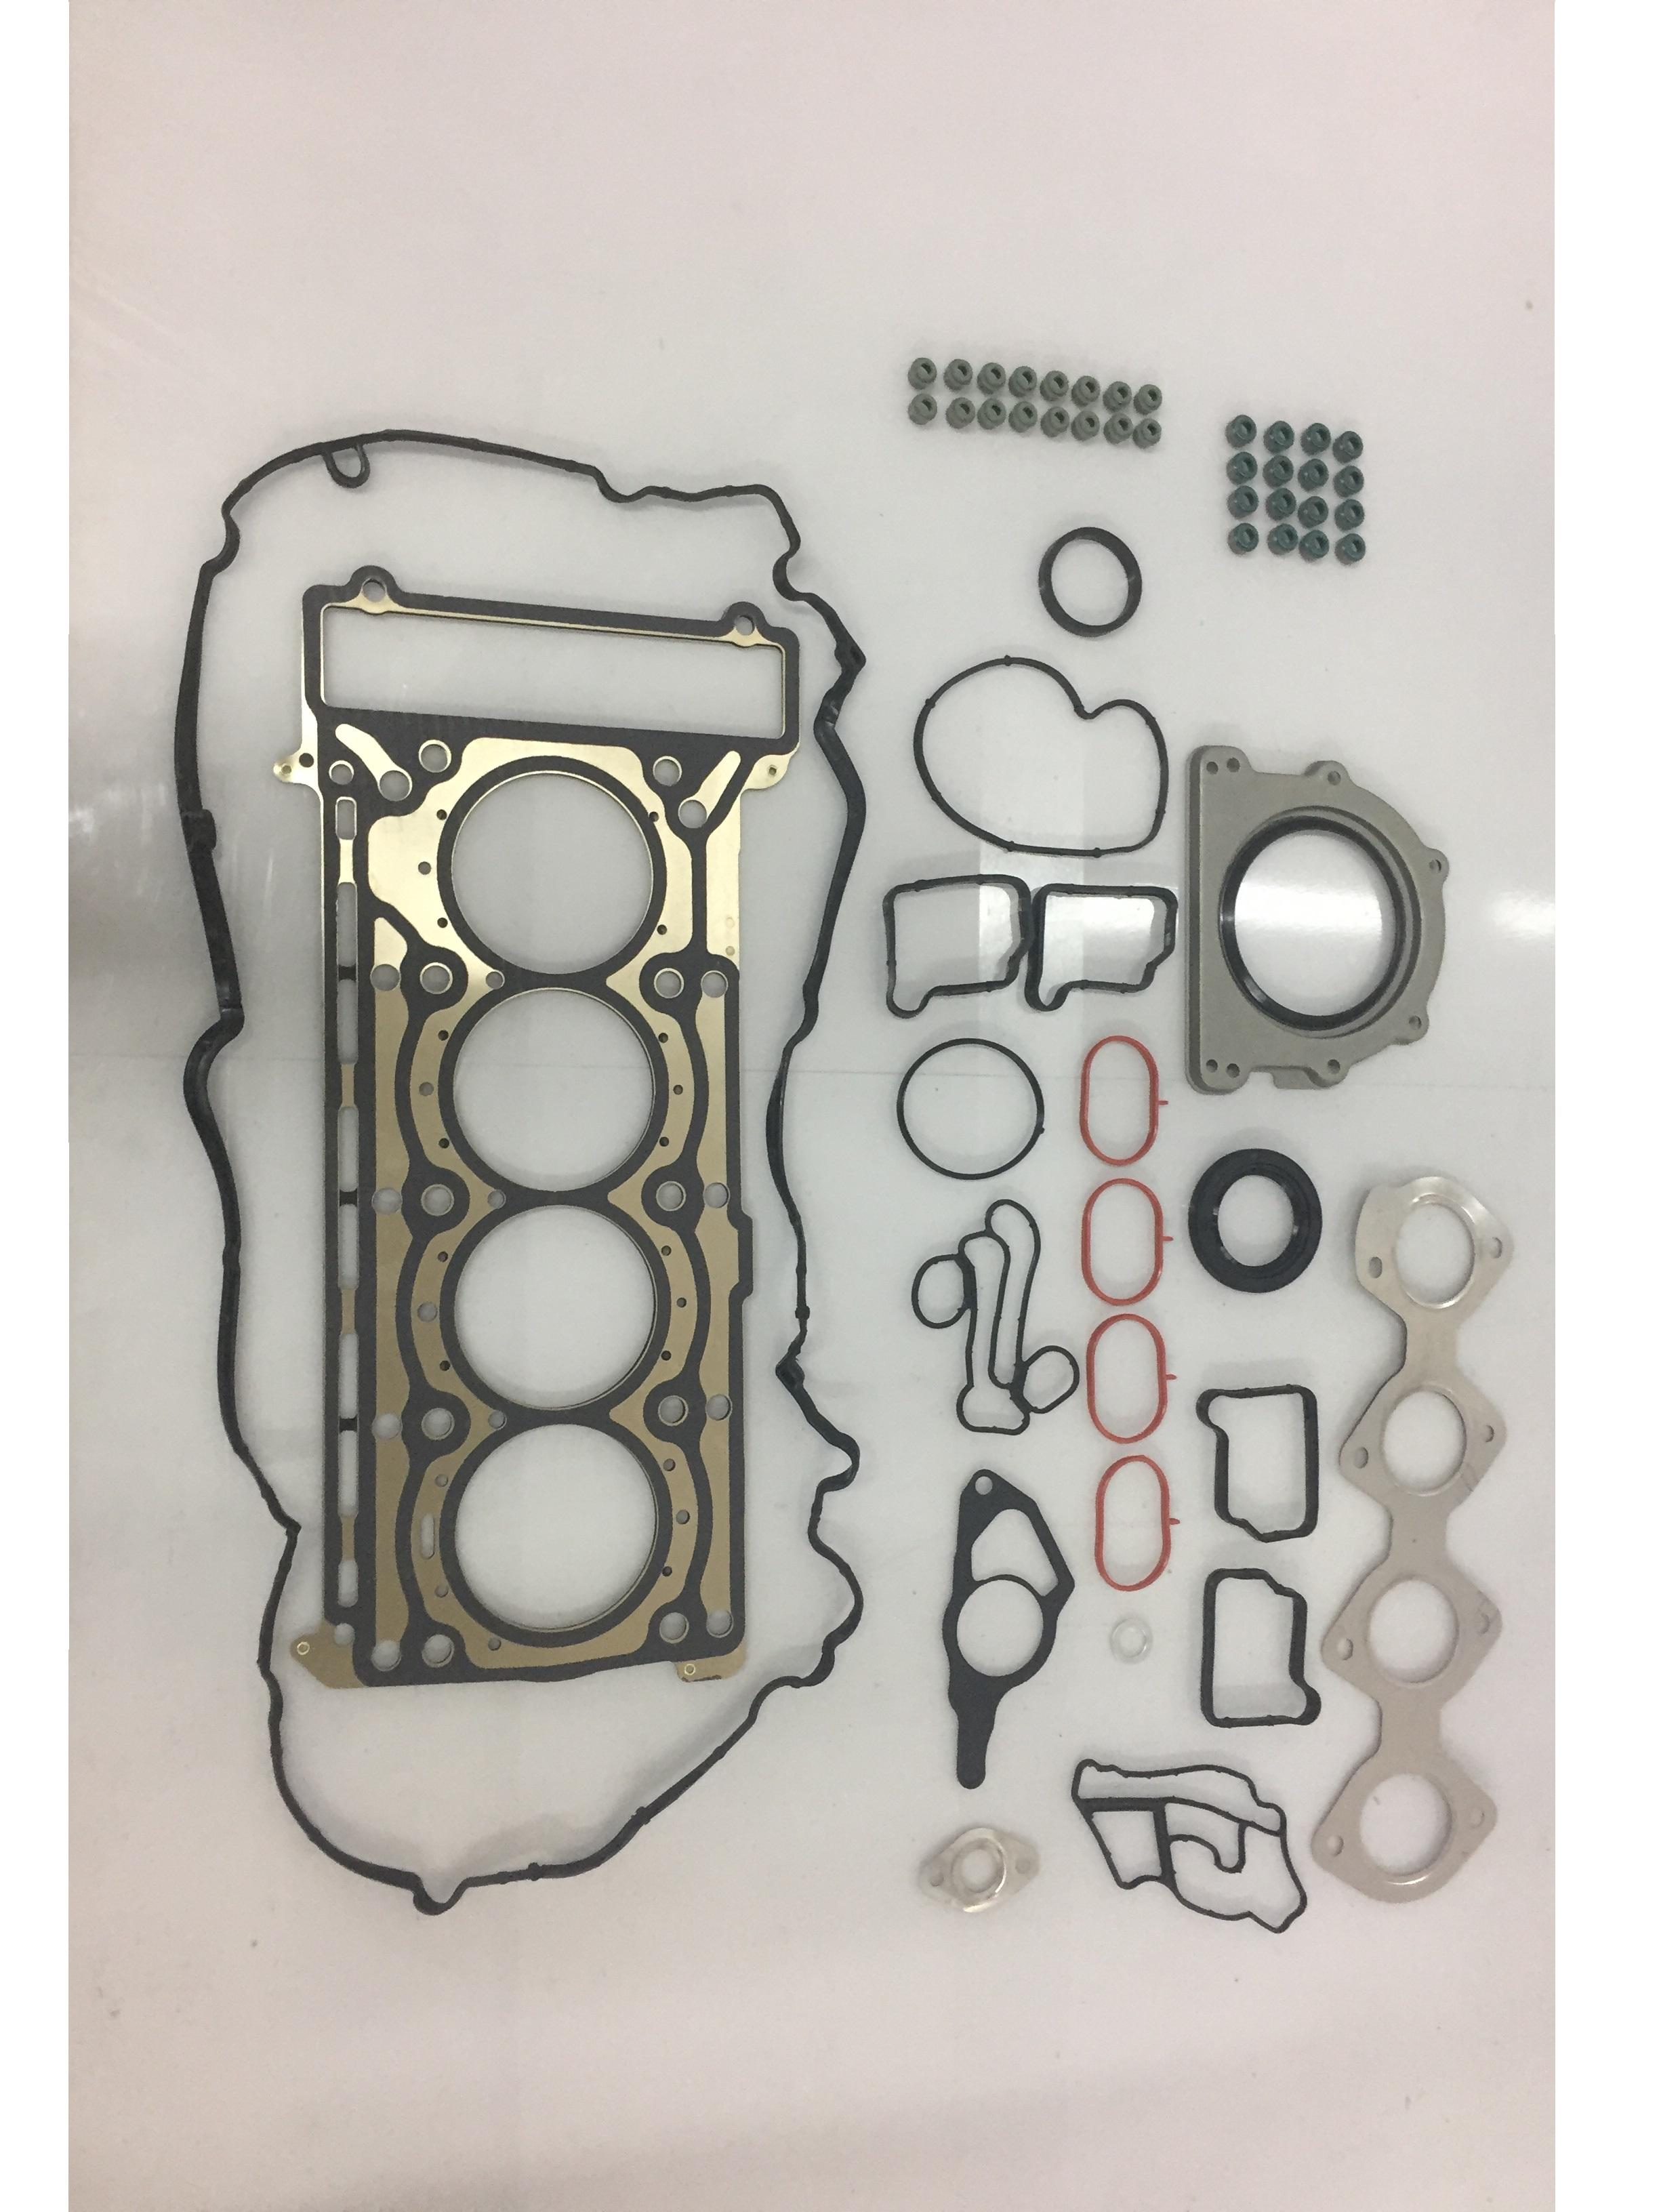 Zylinderkopfdichtung Zylinderkopfdichtsatz Audi Seat VW 1,8 TFSI CDA CDAA NEU